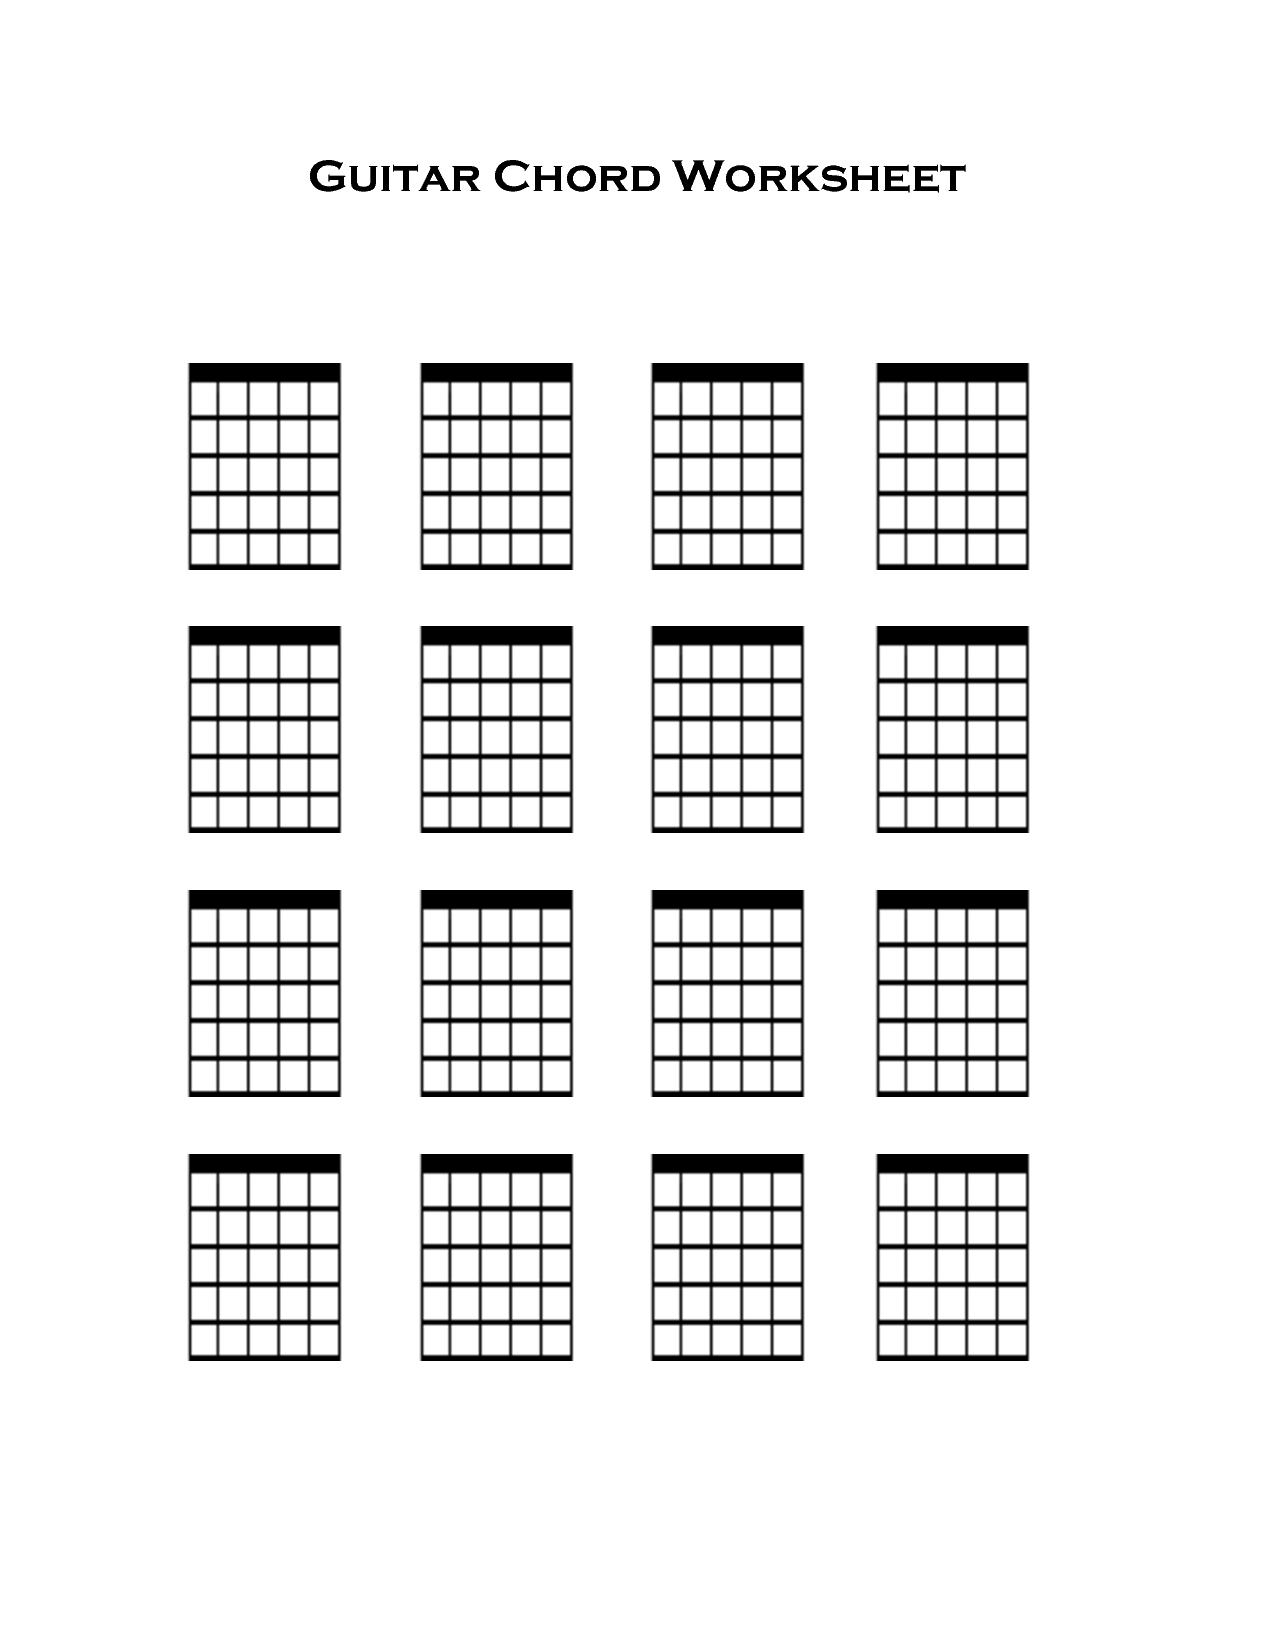 Blank Guitar Tab Sheets - Google Search | Music In 2019 | Guitar - Free Printable Blank Guitar Chord Charts